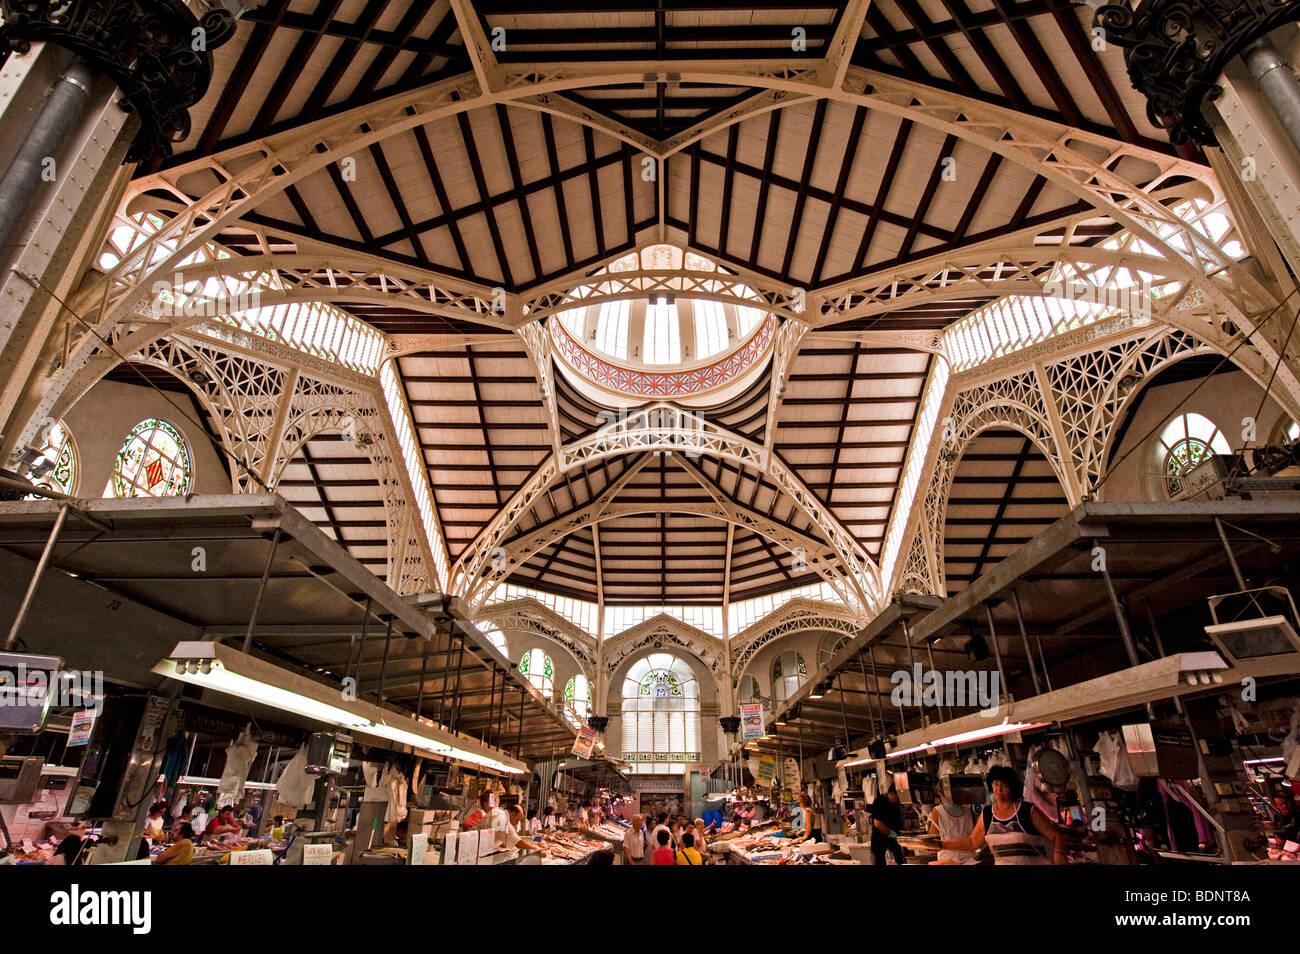 The Mercat Central market in Valencia - Stock Image